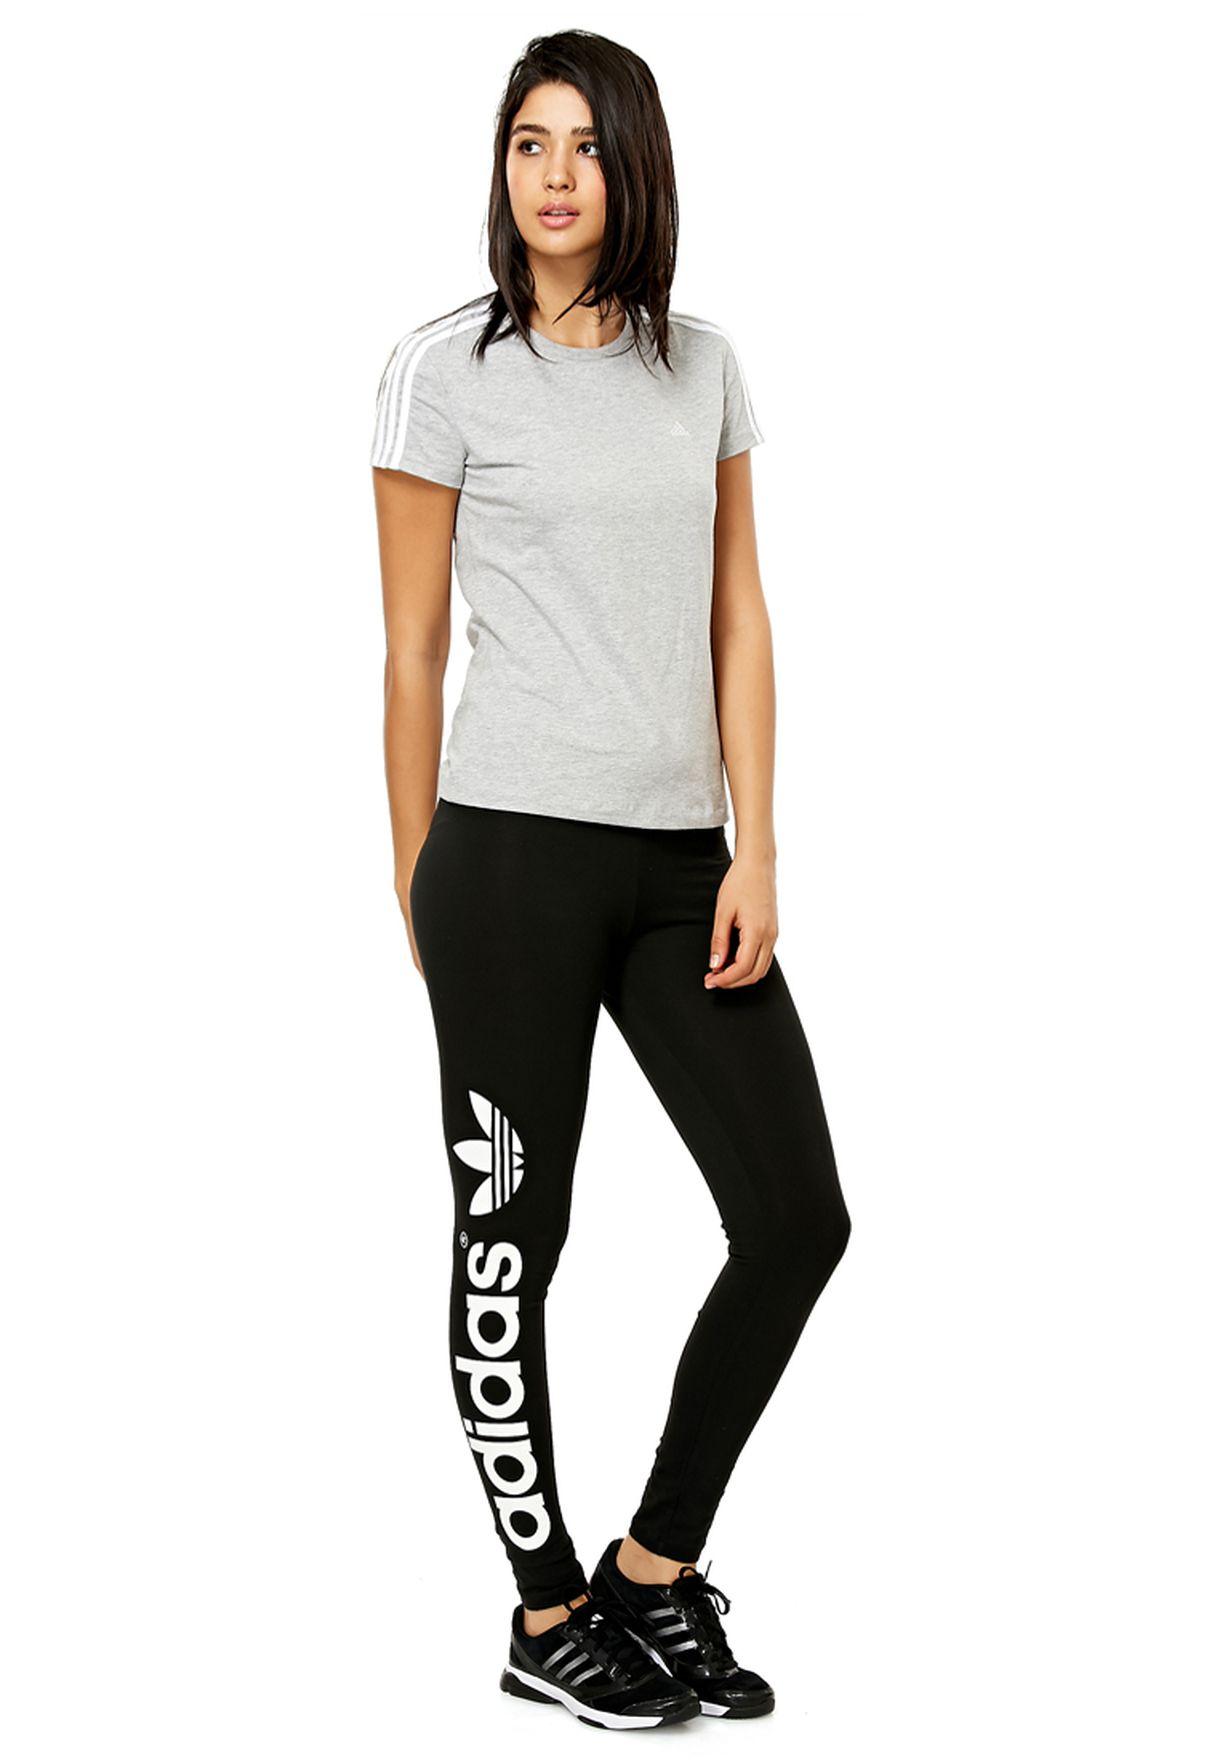 Kuwait G86235 Trf Women In Legging Adidas Black Shop For 8qSza8